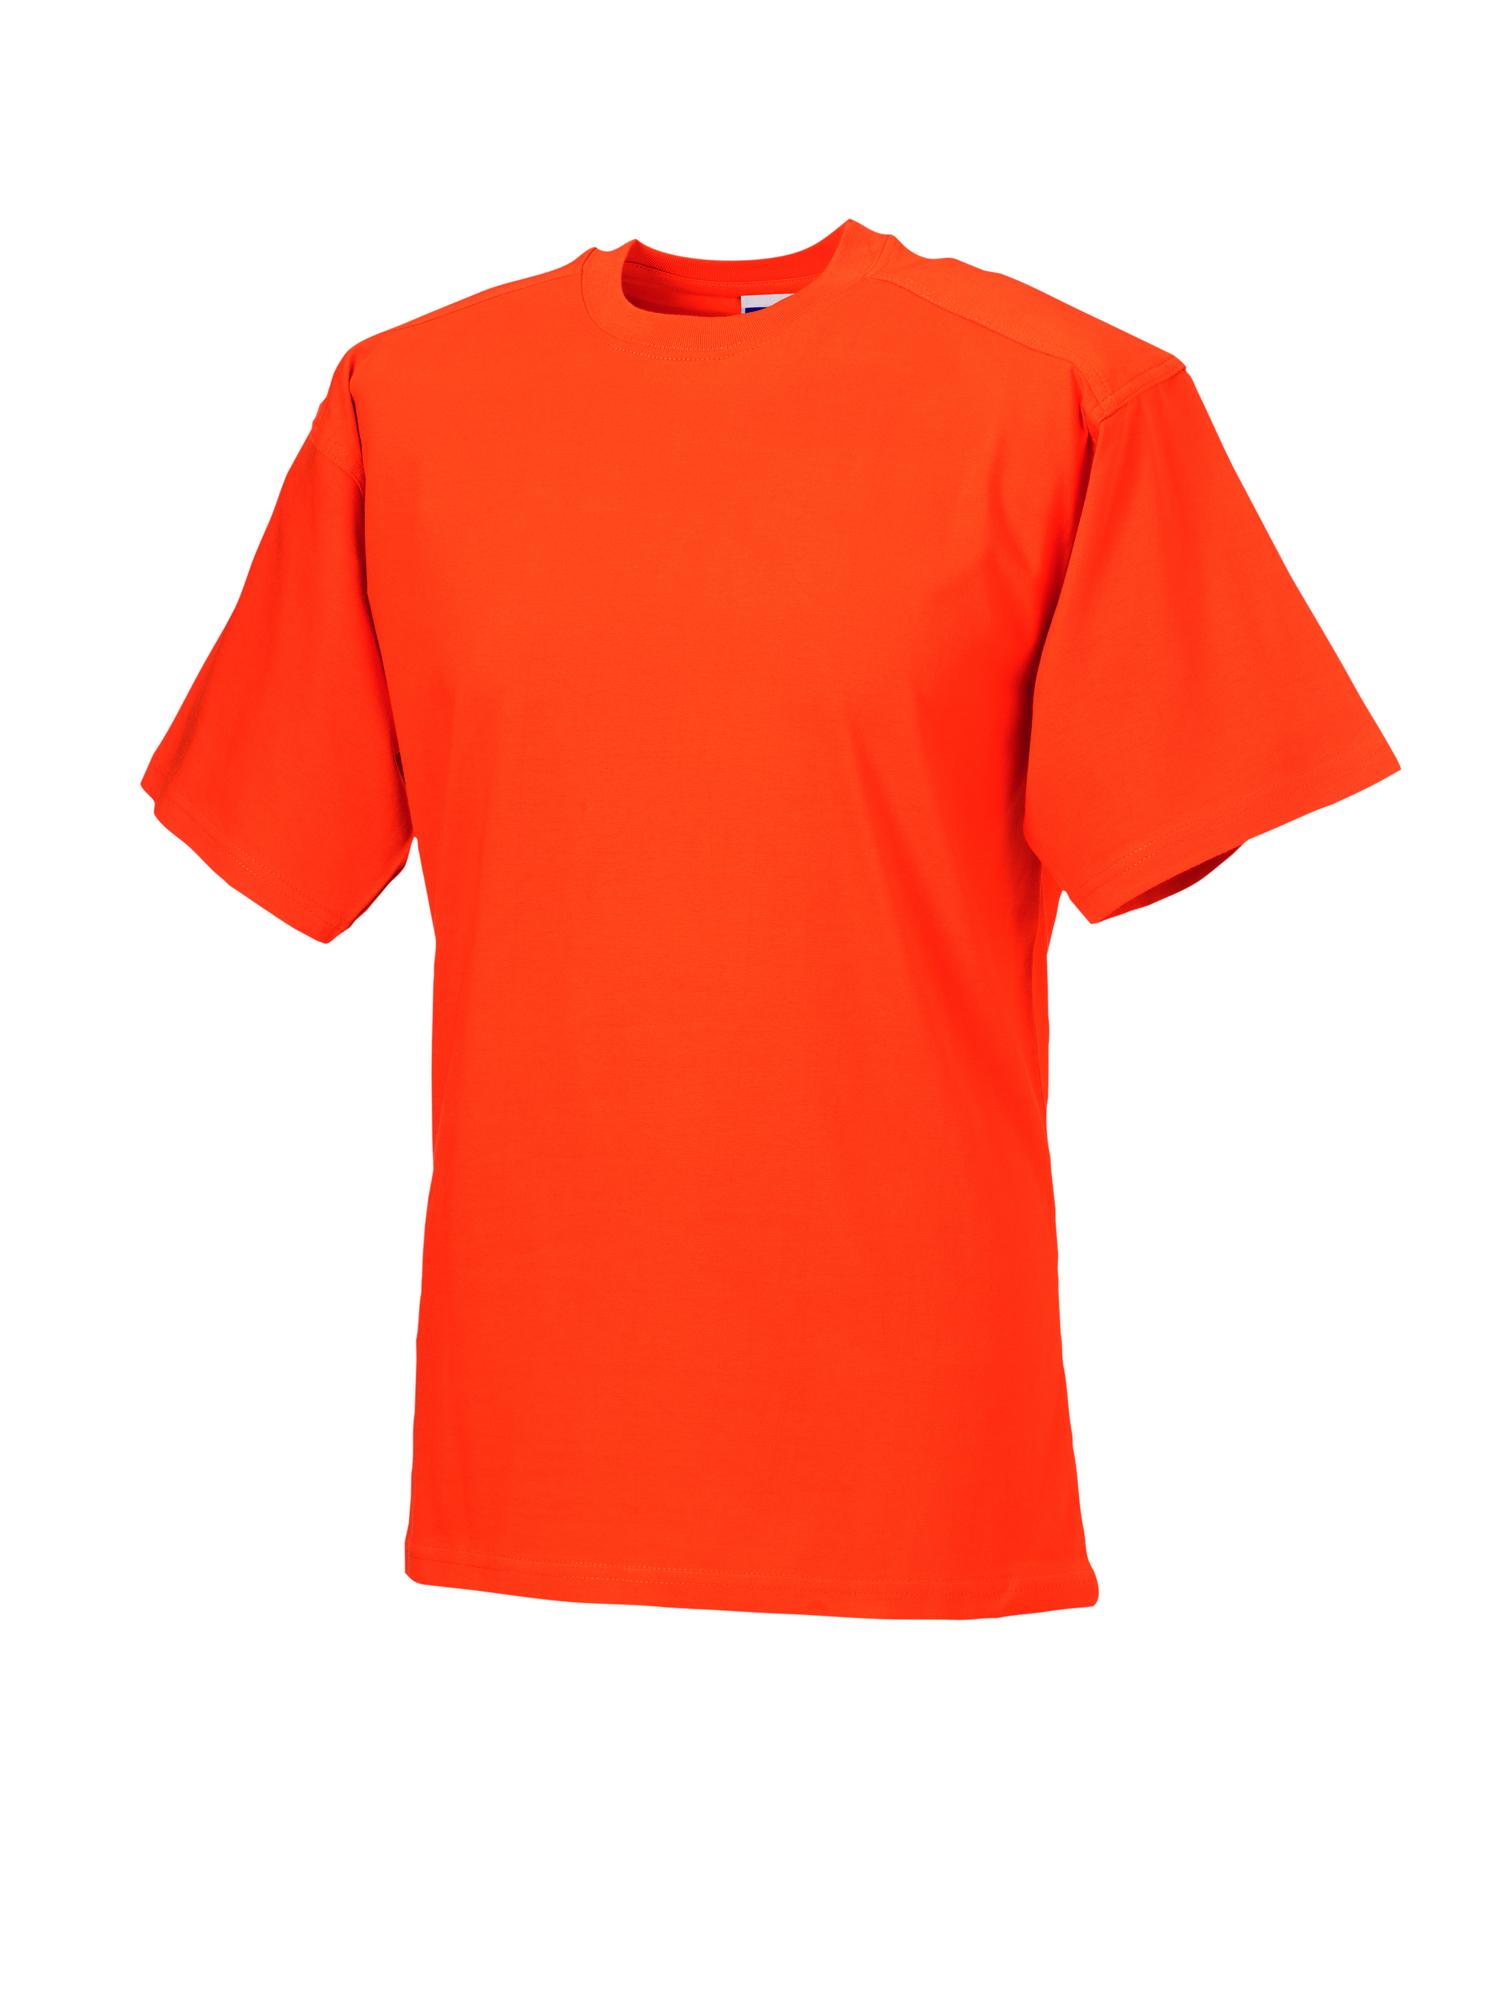 Heavy Duty T-Shirt - Orange - S